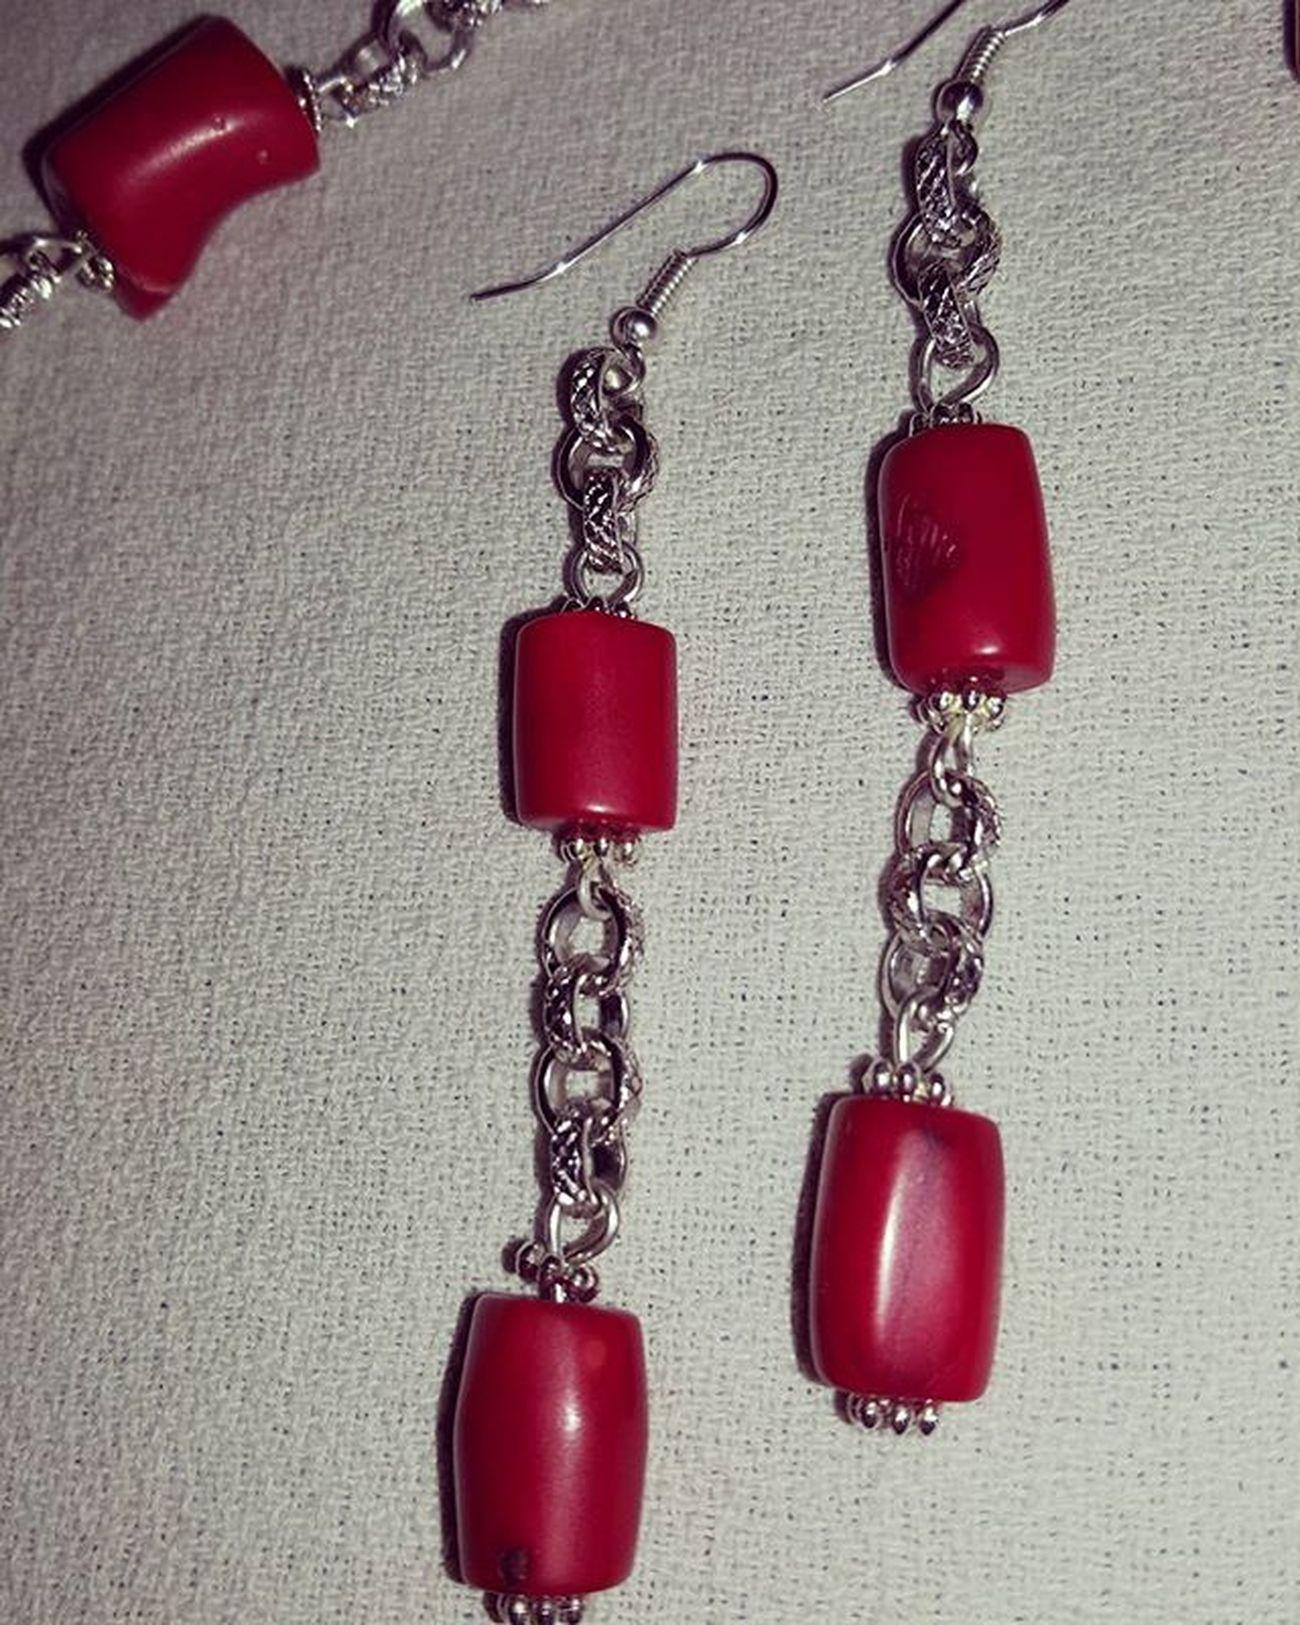 Summer jewelry Summerjewelry Jewelryhomemade Earringshomemade Coralbamboo Coral Corallo Corallobambù Bigiotteriaartigianale Bigiotteria Hobby Orecchinifattiamano